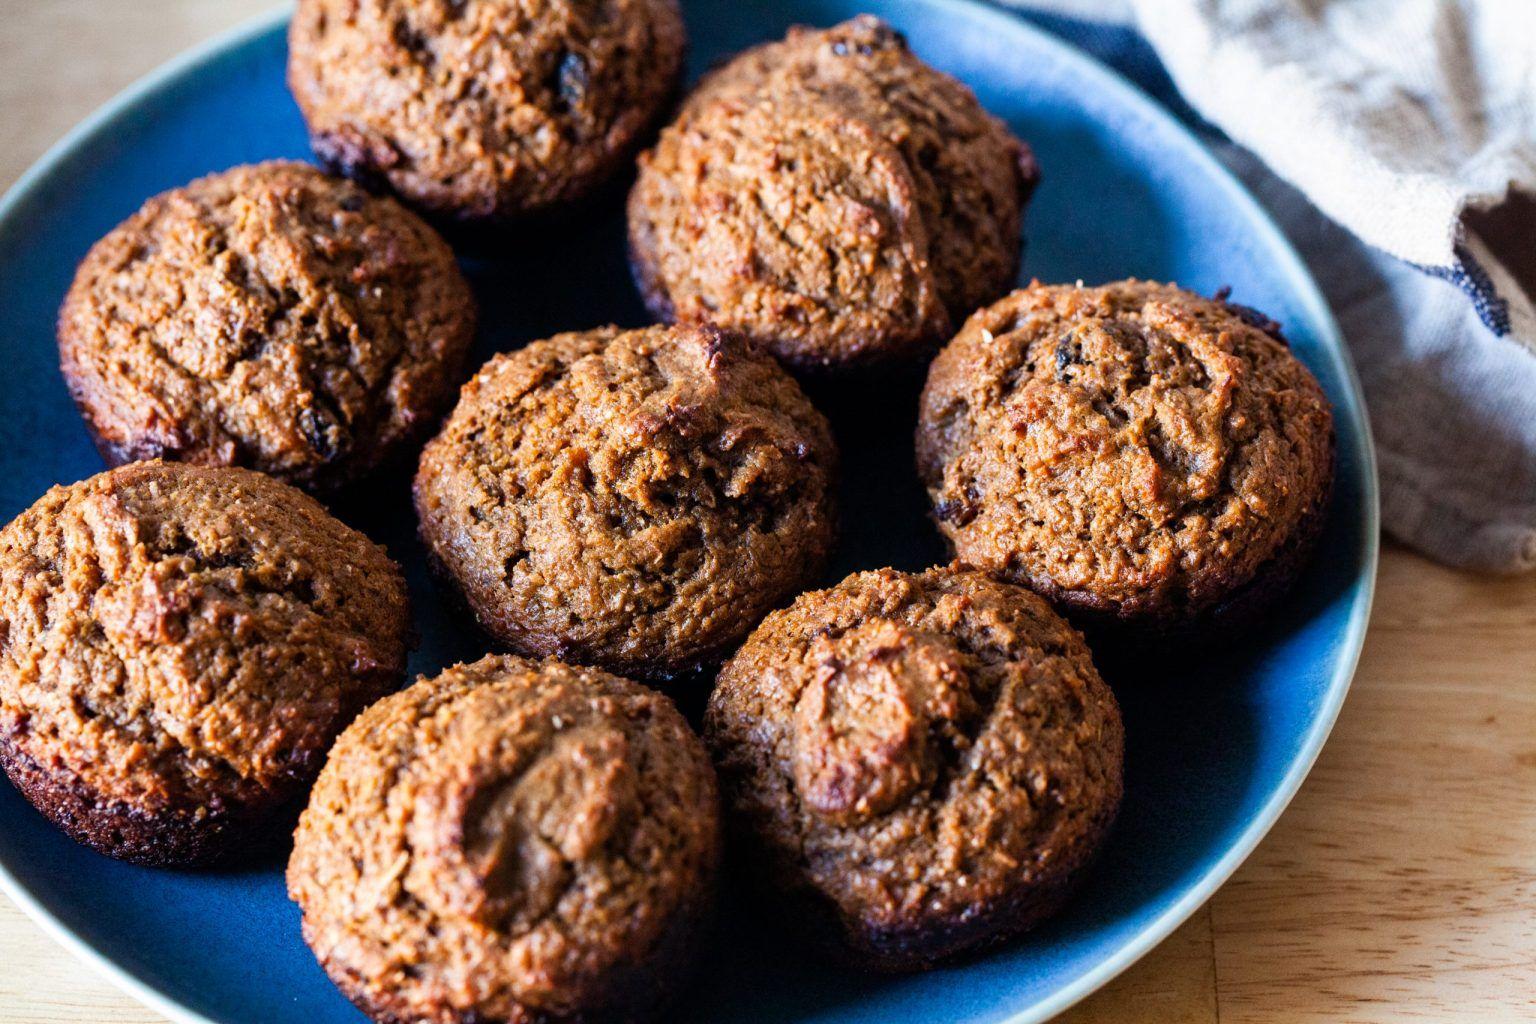 Sour Cream Bran Muffins Recipe In 2020 Healthy Sour Cream Smitten Kitchen Recipes Sour Cream